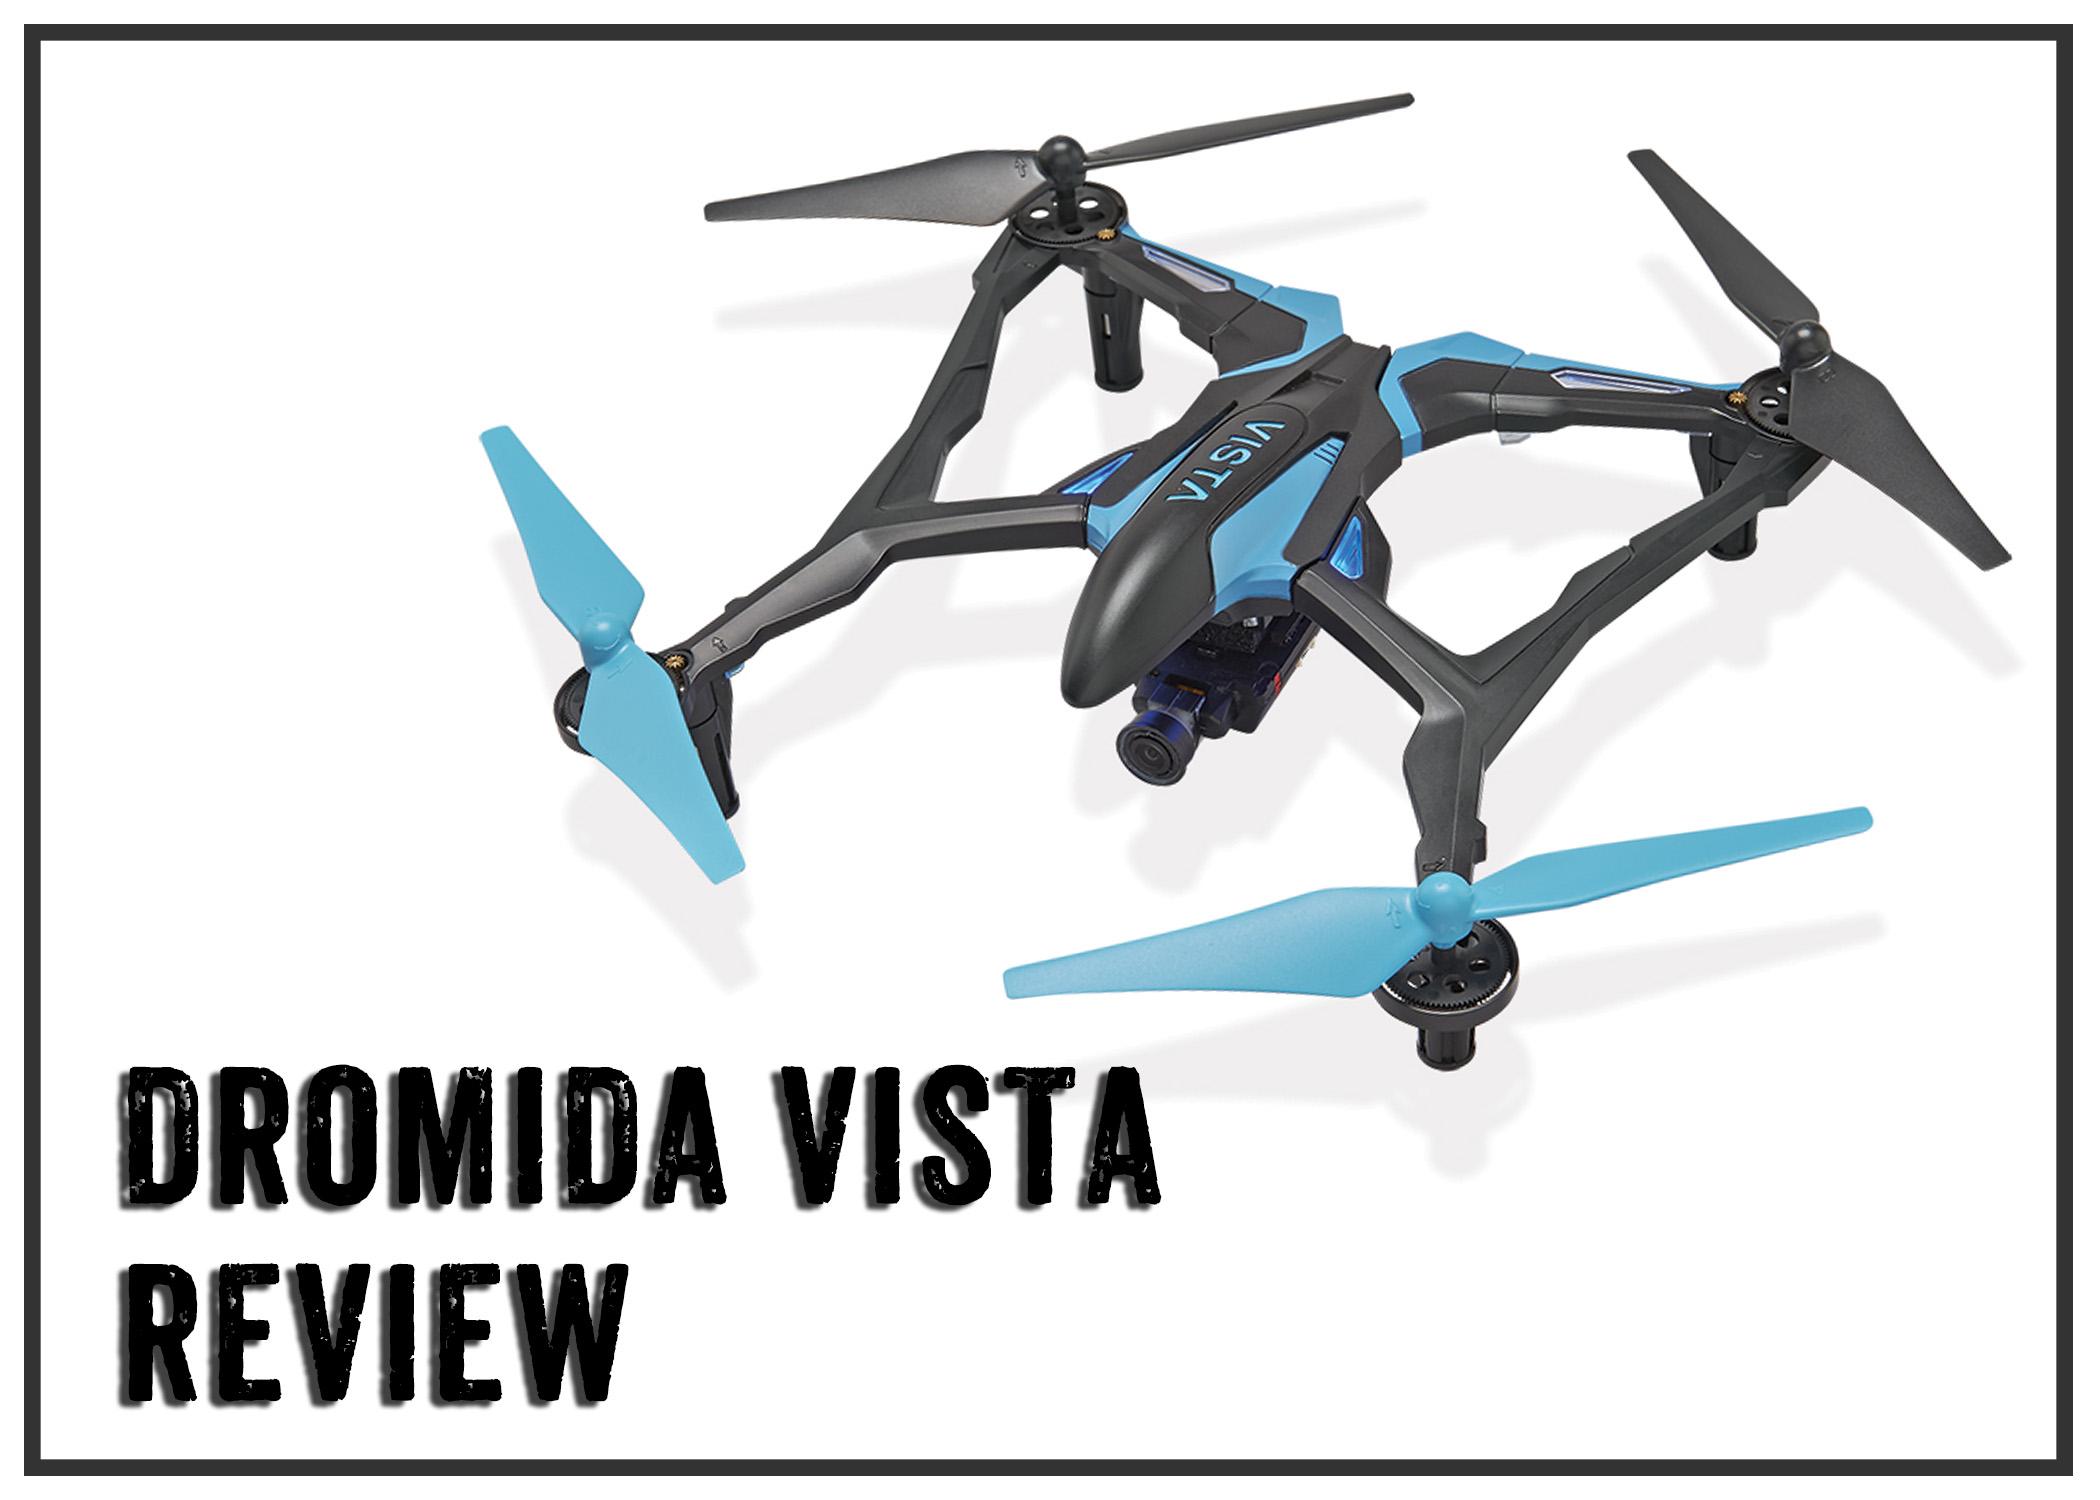 Dromida Vista: The Powerful Drone for Videographers